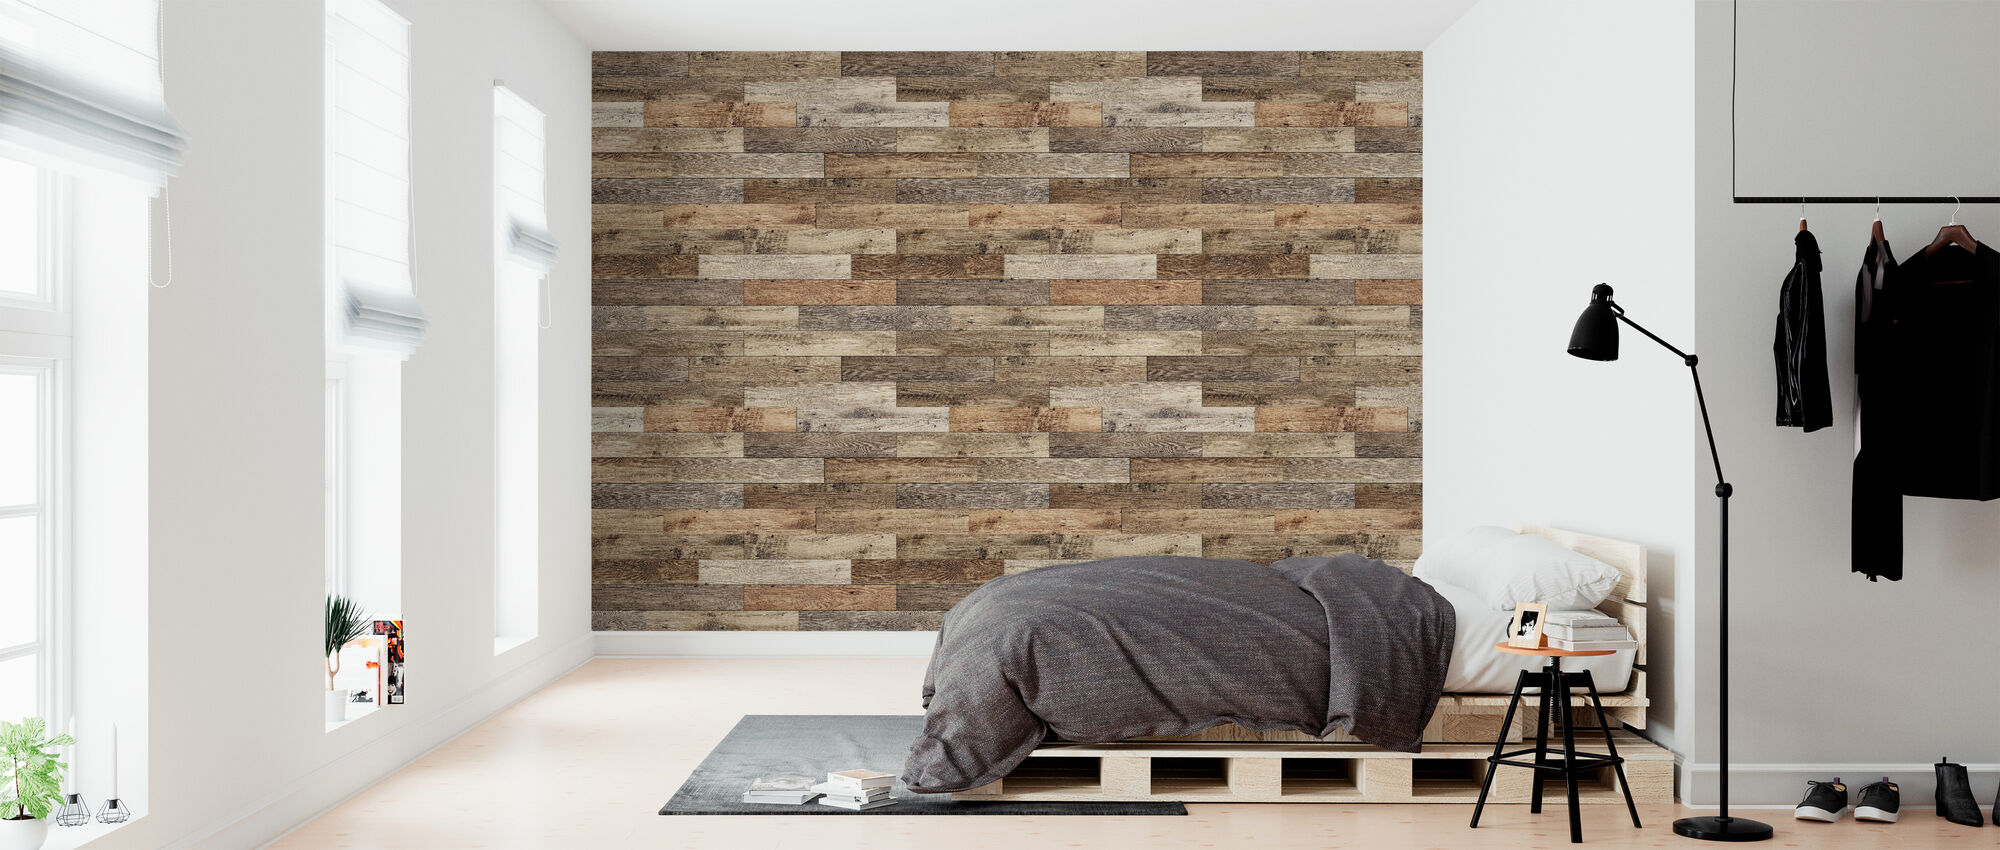 Rustic Joined Wood – Individuelle Tapeten höchster Qualität ...